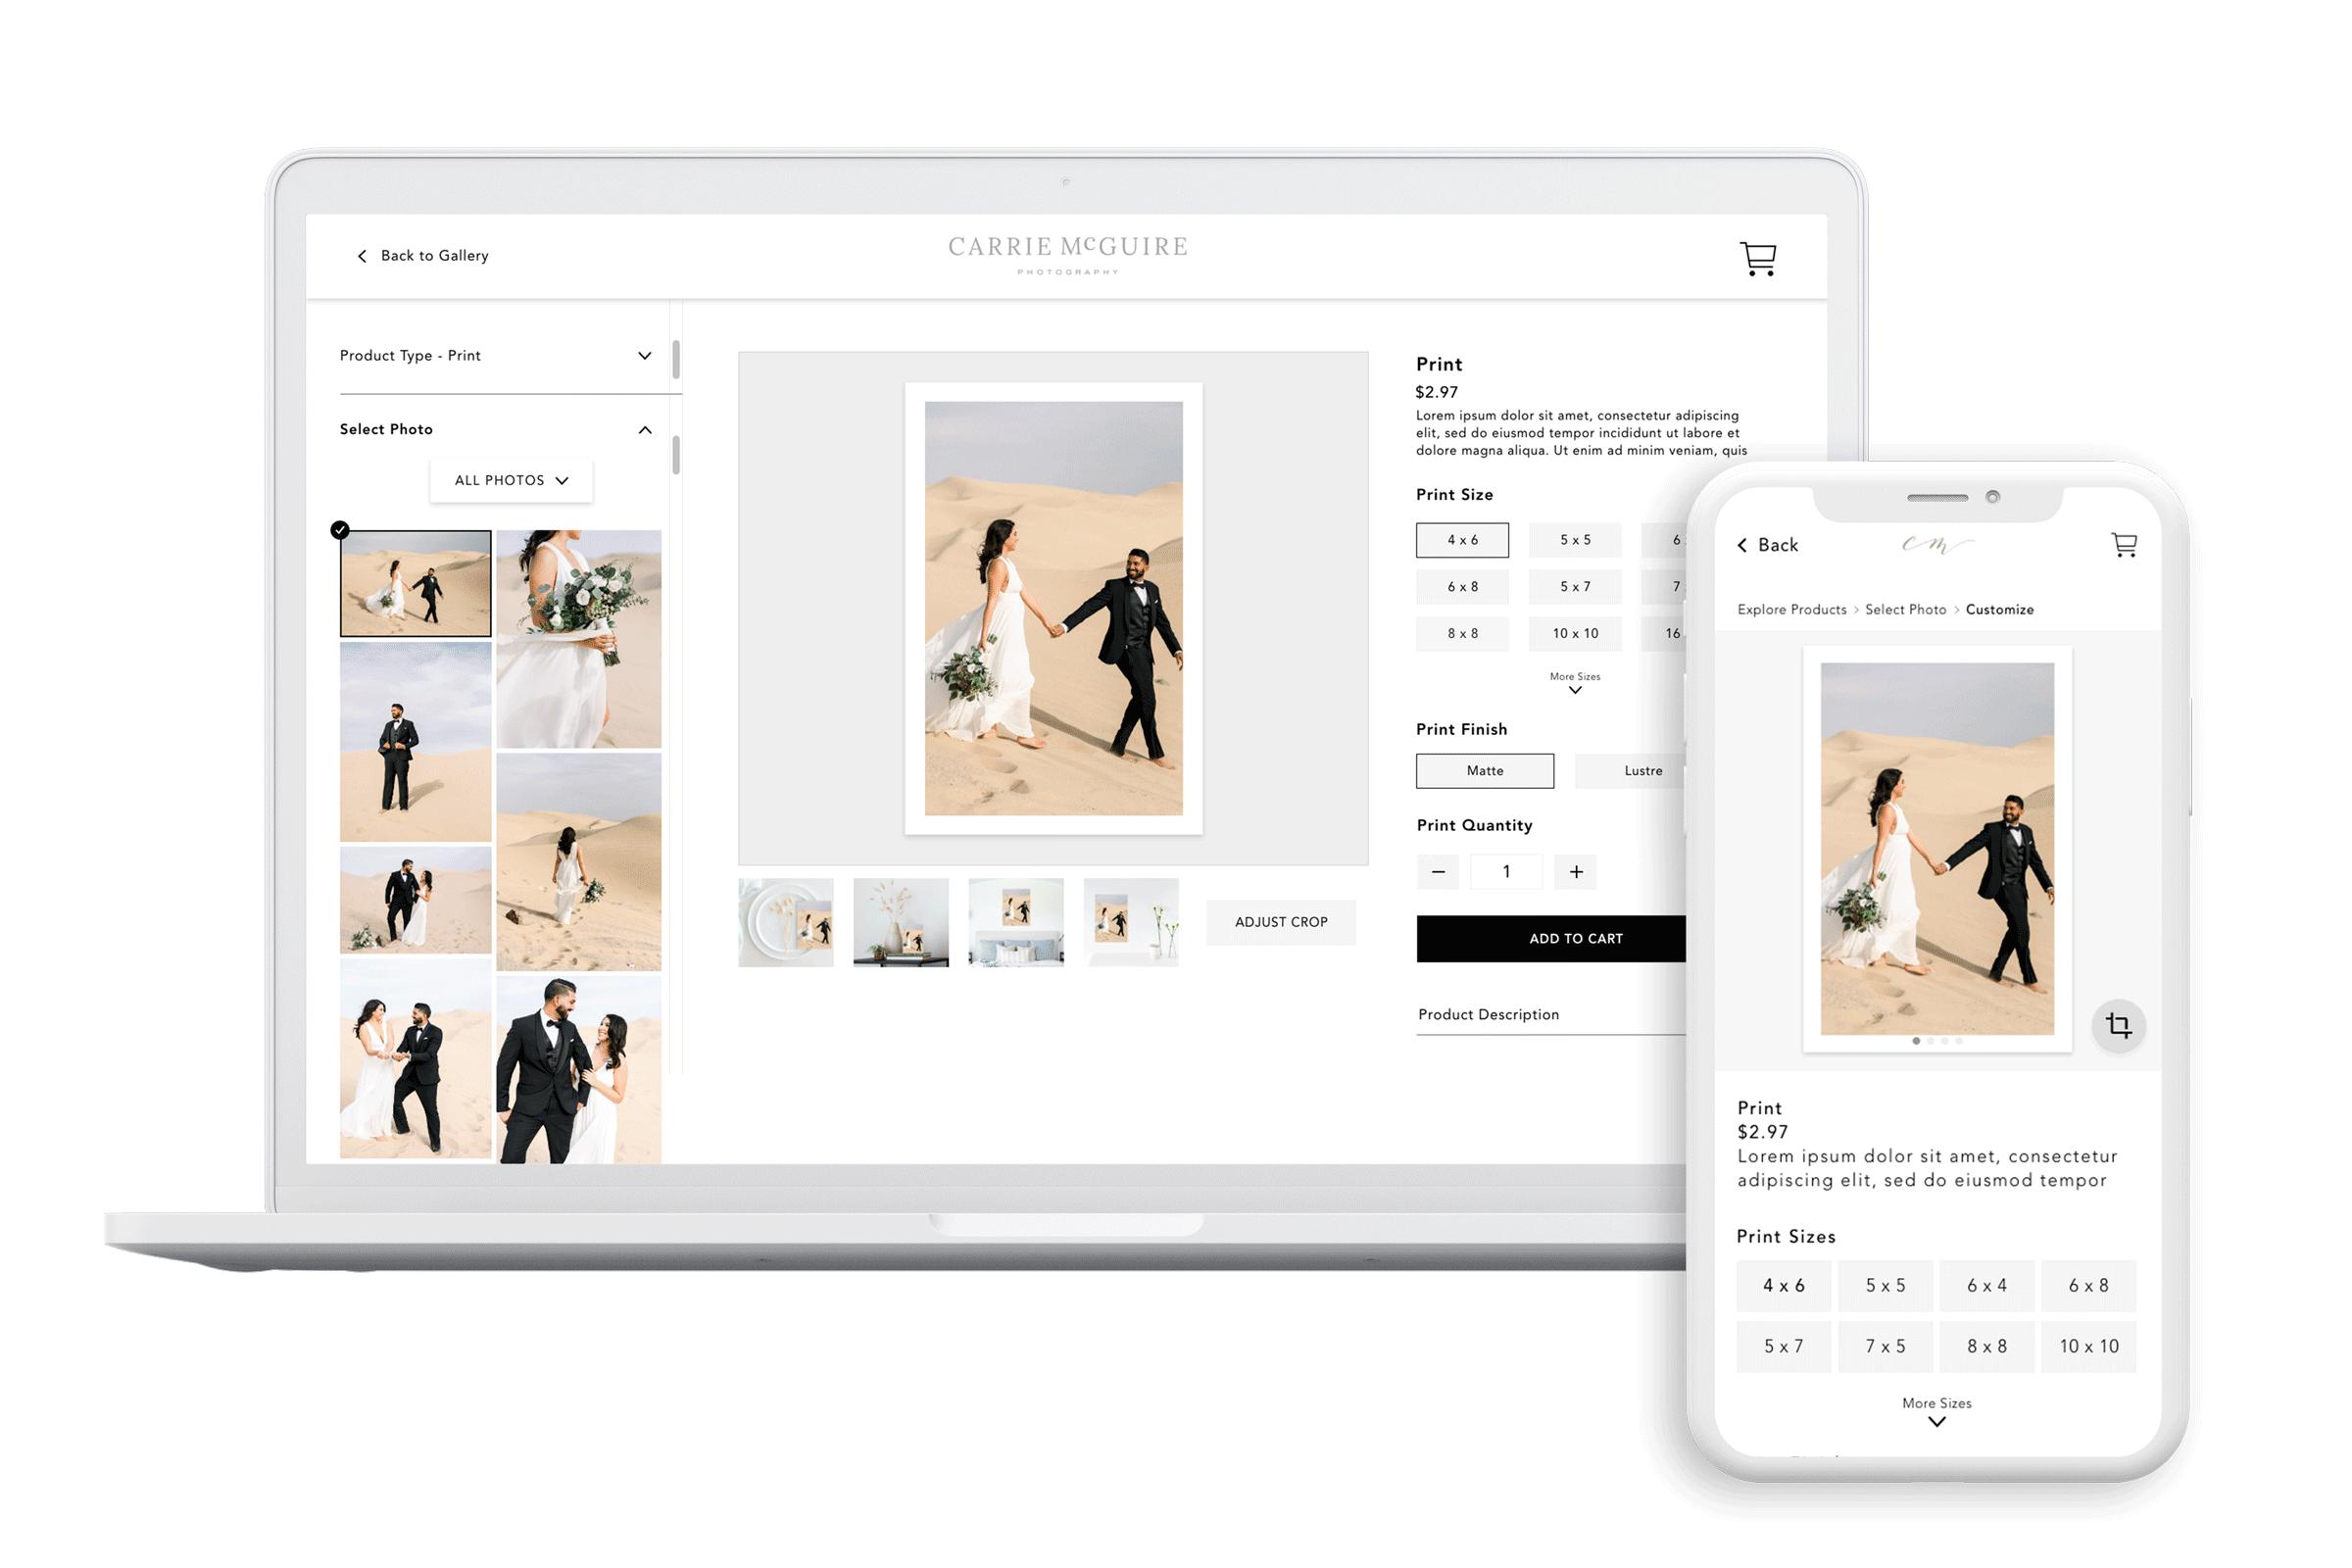 CloudSpot Store Redesign - Laptop & Phone